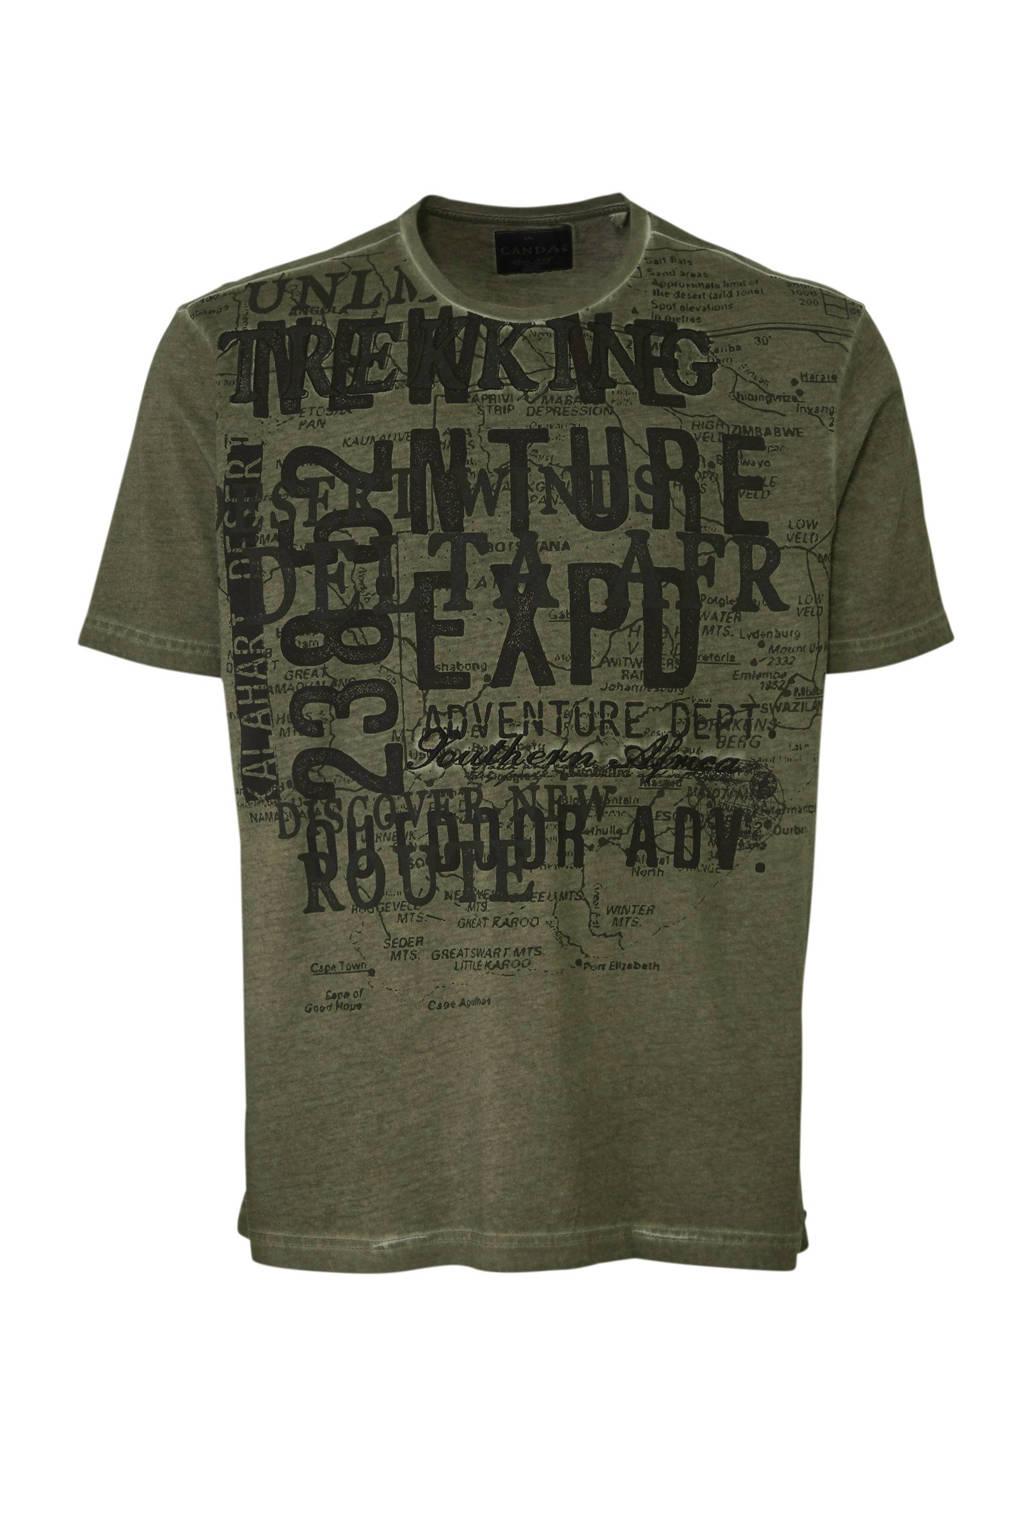 C&A XL Canda T-shirt met printopdruk, Donkergroen